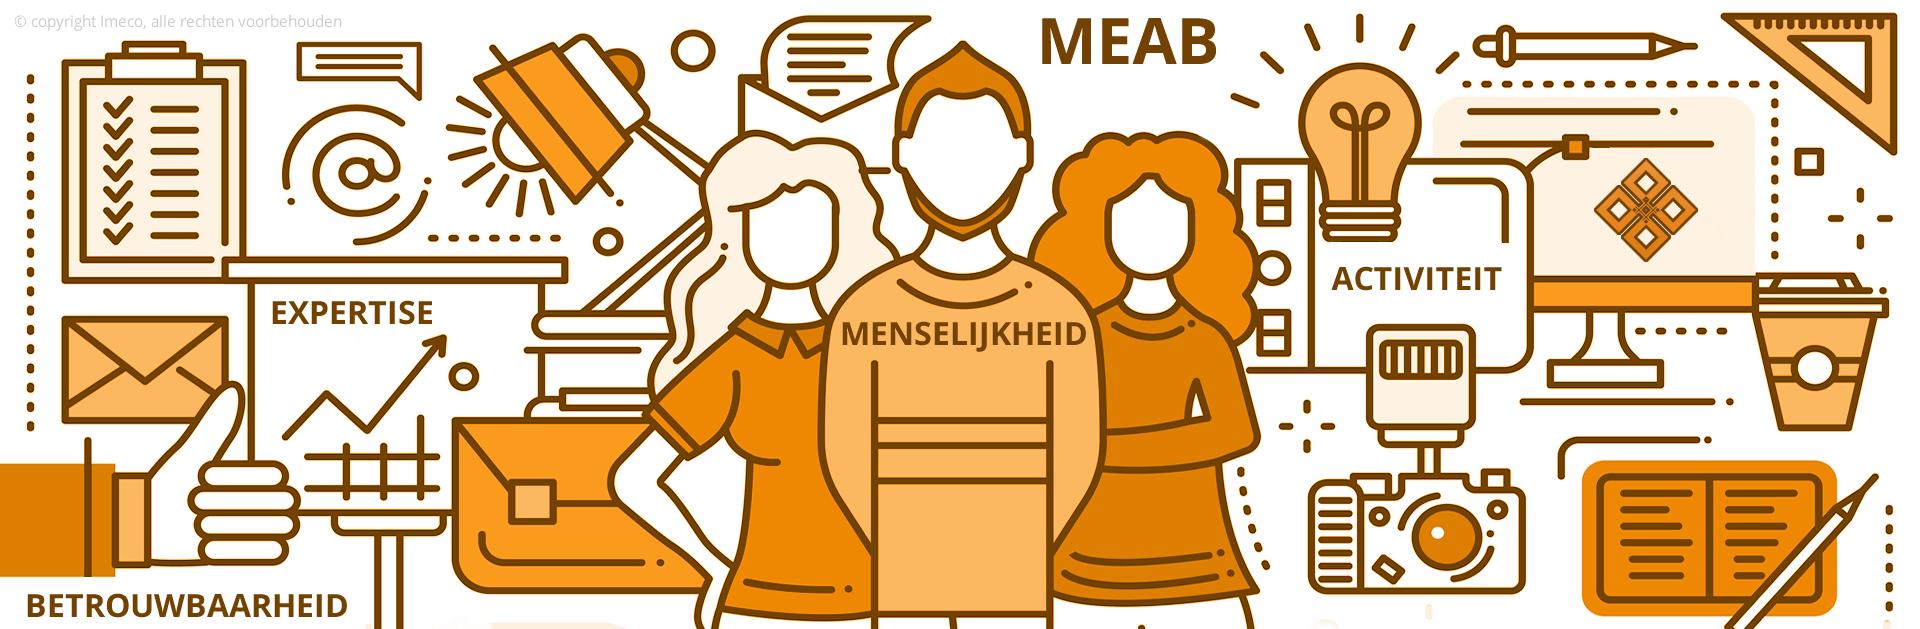 MEAB = Menselijkheid, Expertise, Activiteit, Betrouwbaarheid